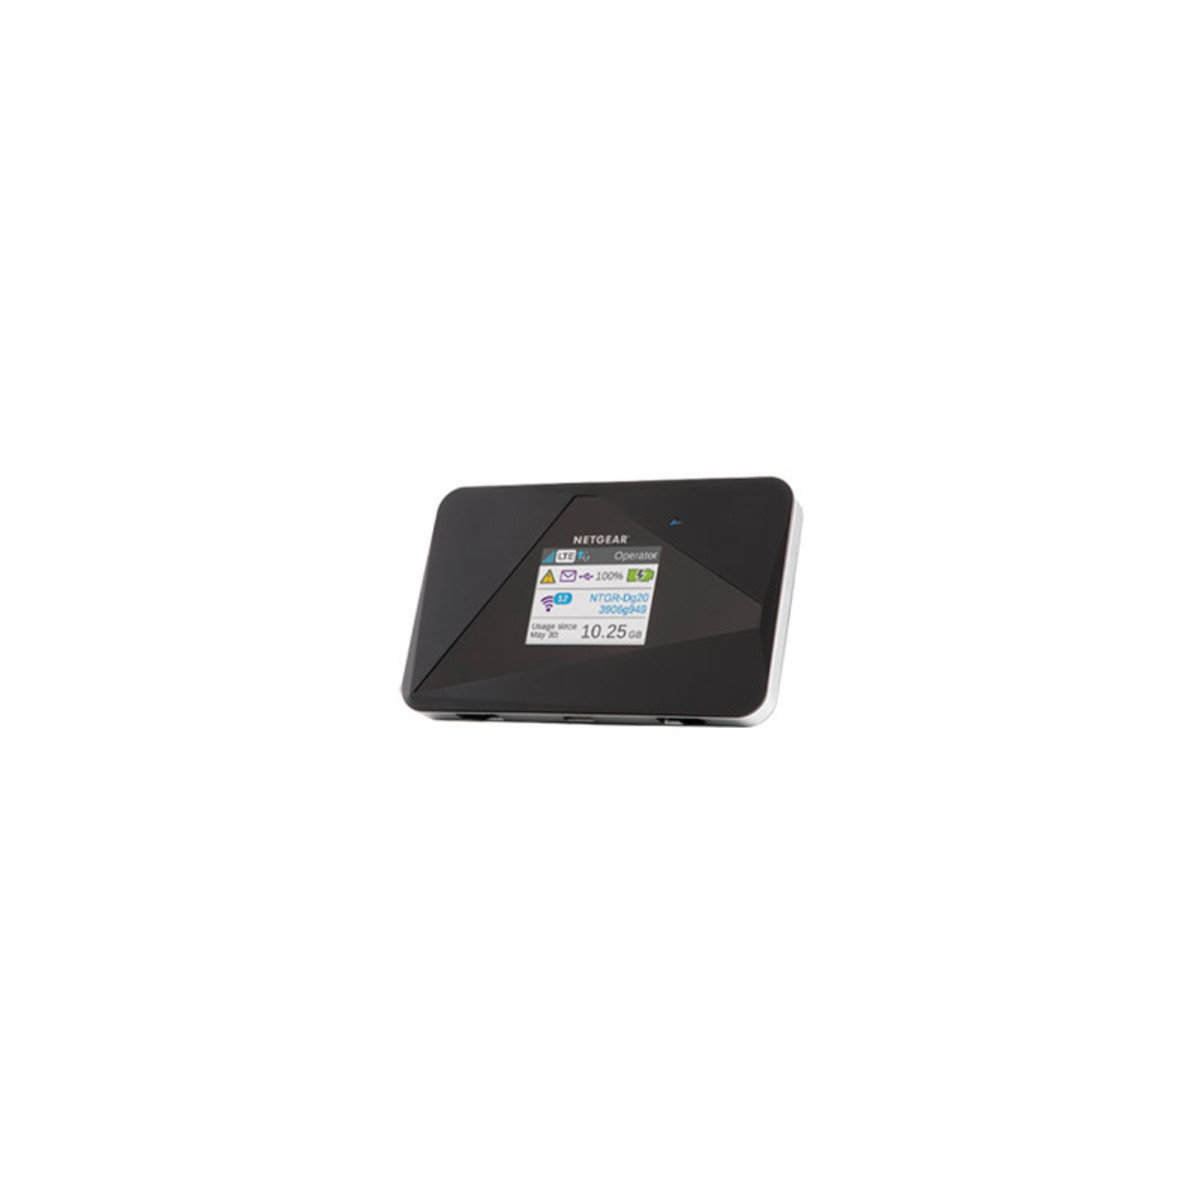 3G/4G-LTE TDD/FDD 行動網絡熱點分享器 AirCard 785S